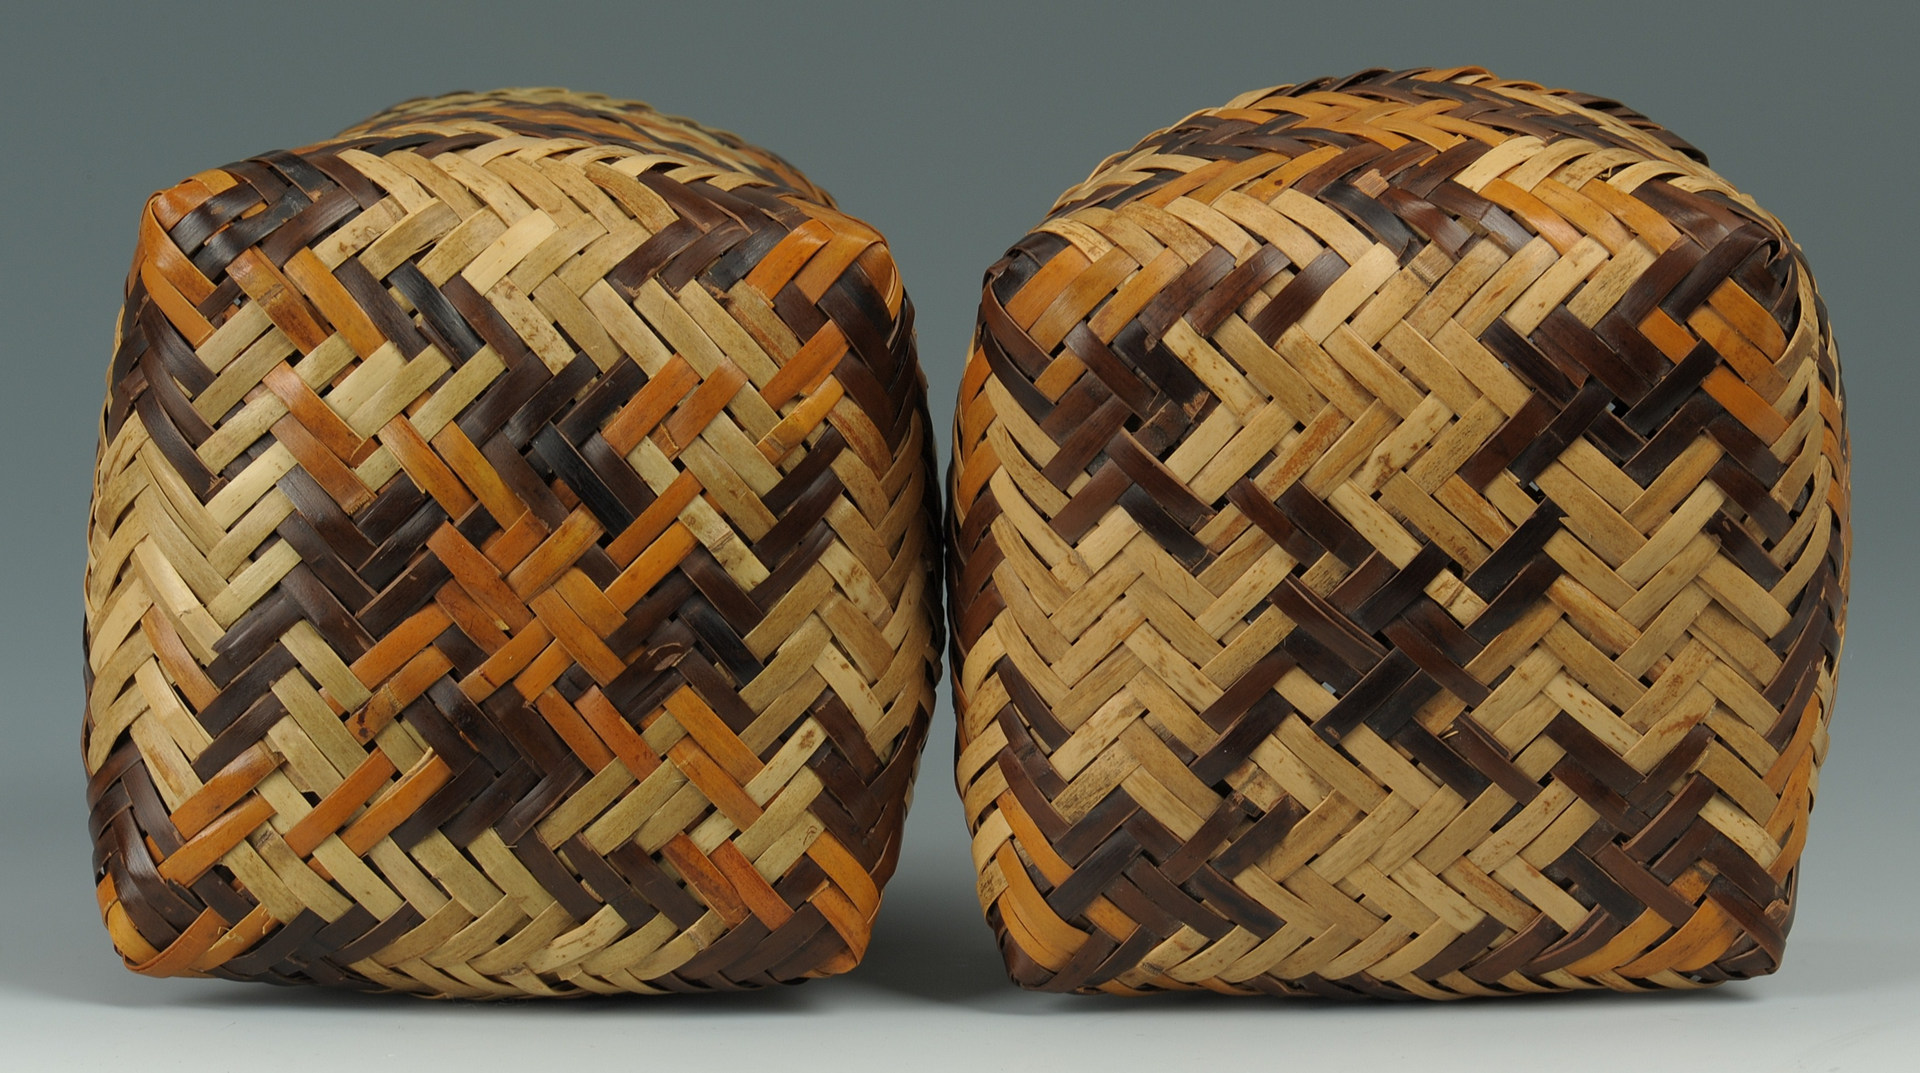 Lot 377: Miniature Cherokee rivercane basket by R. Bradley